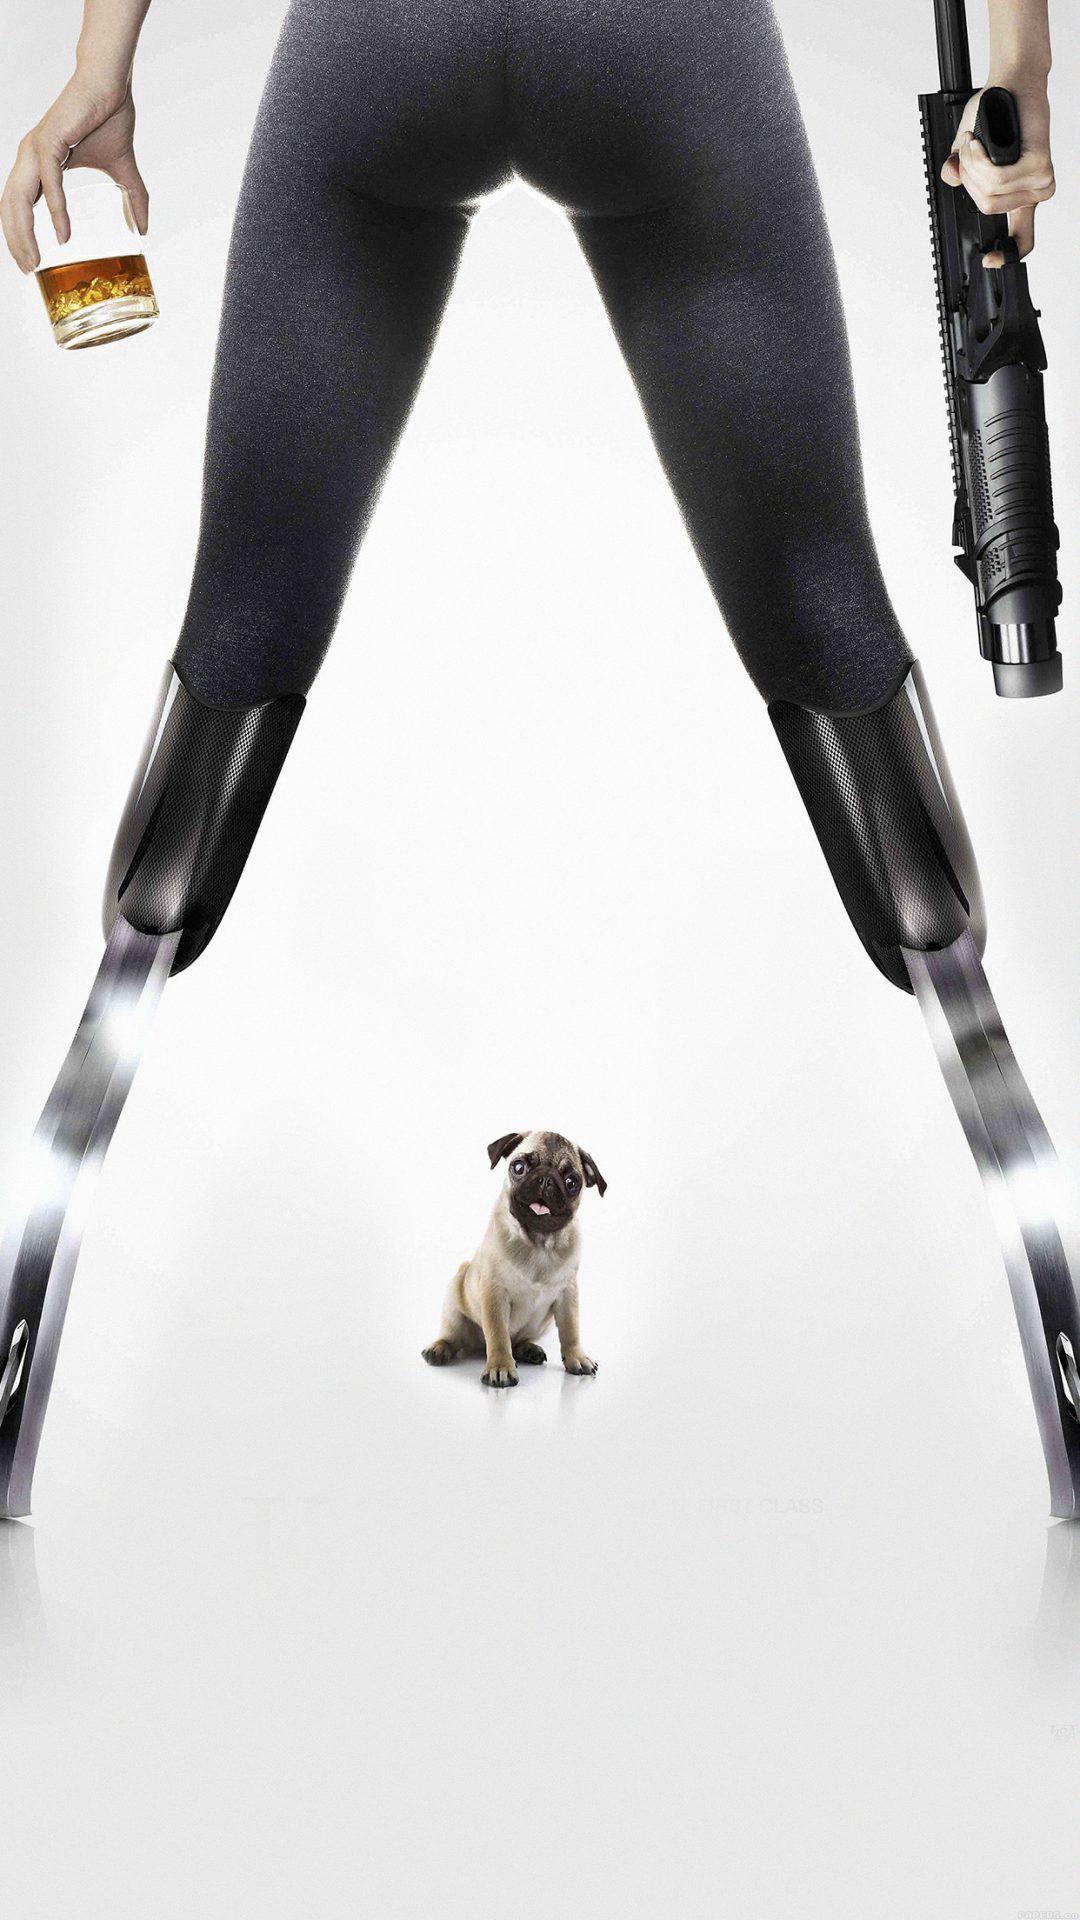 Kingsman Poster Dog Art Film